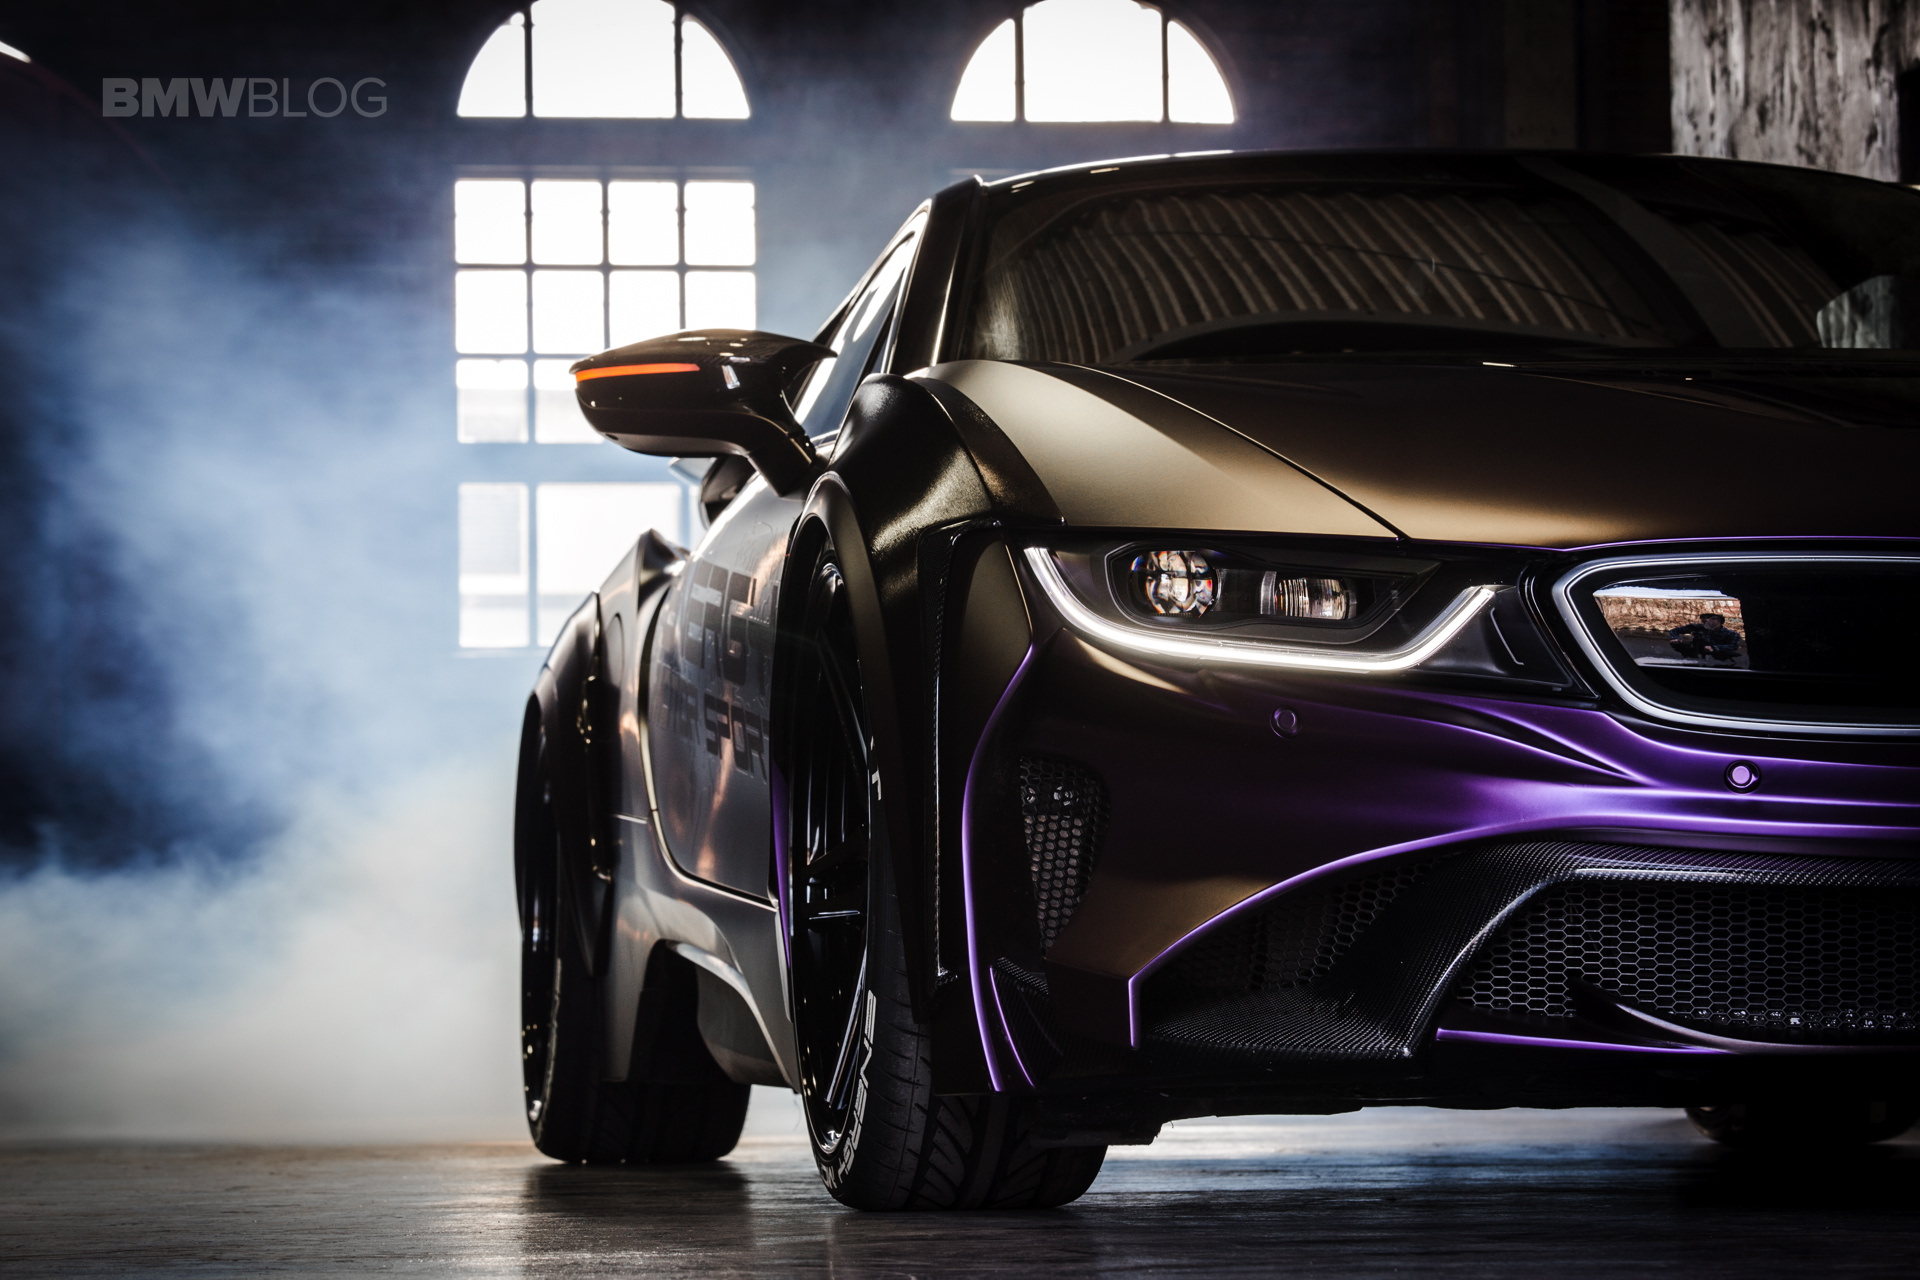 Bmw Evo I8 Dark Knight Edition Is The Batmobile We All Want